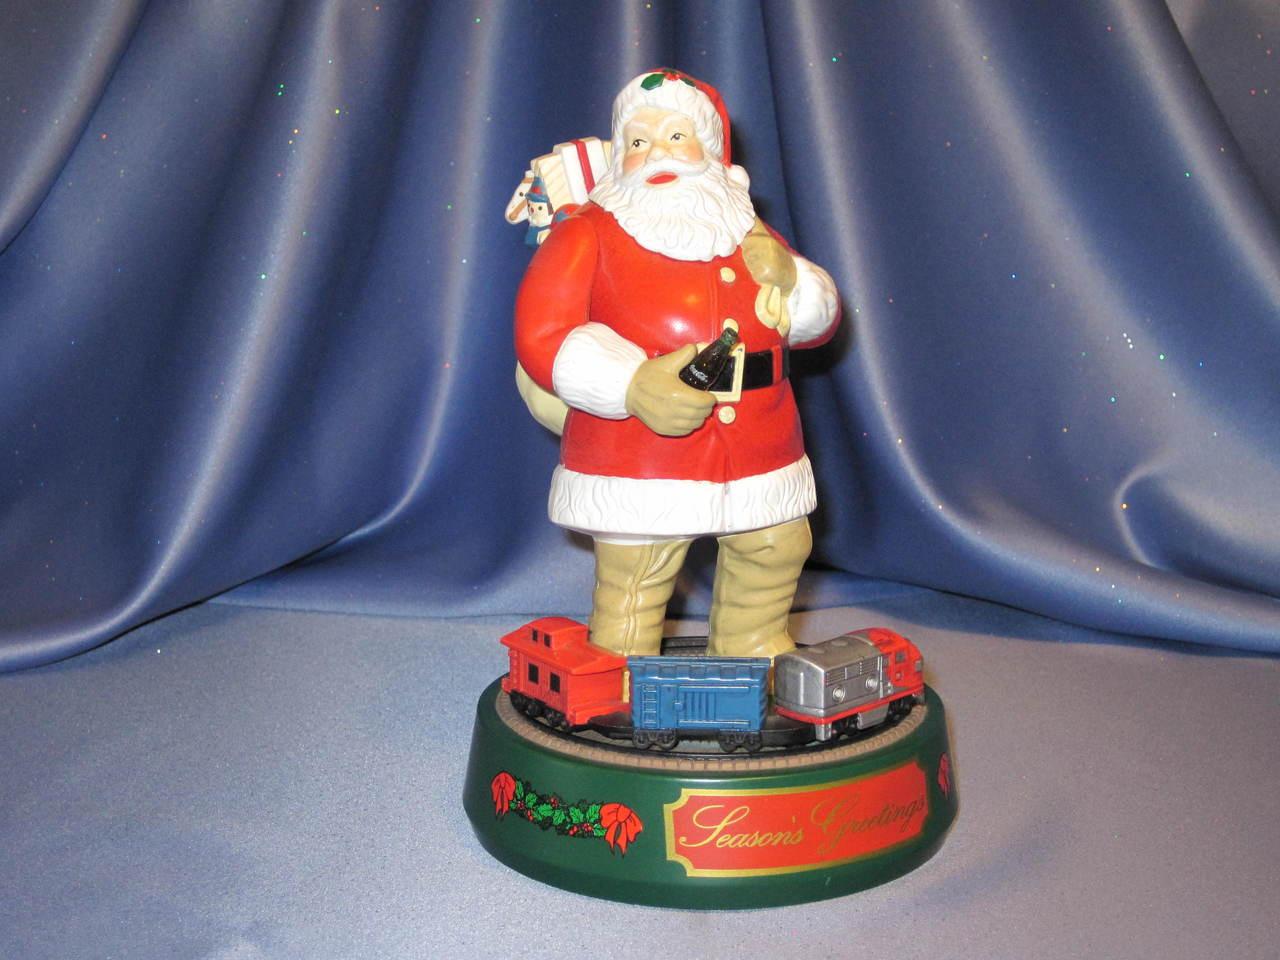 Coca-Cola - Santa Claus with Train - Coin Bank by ERTL.